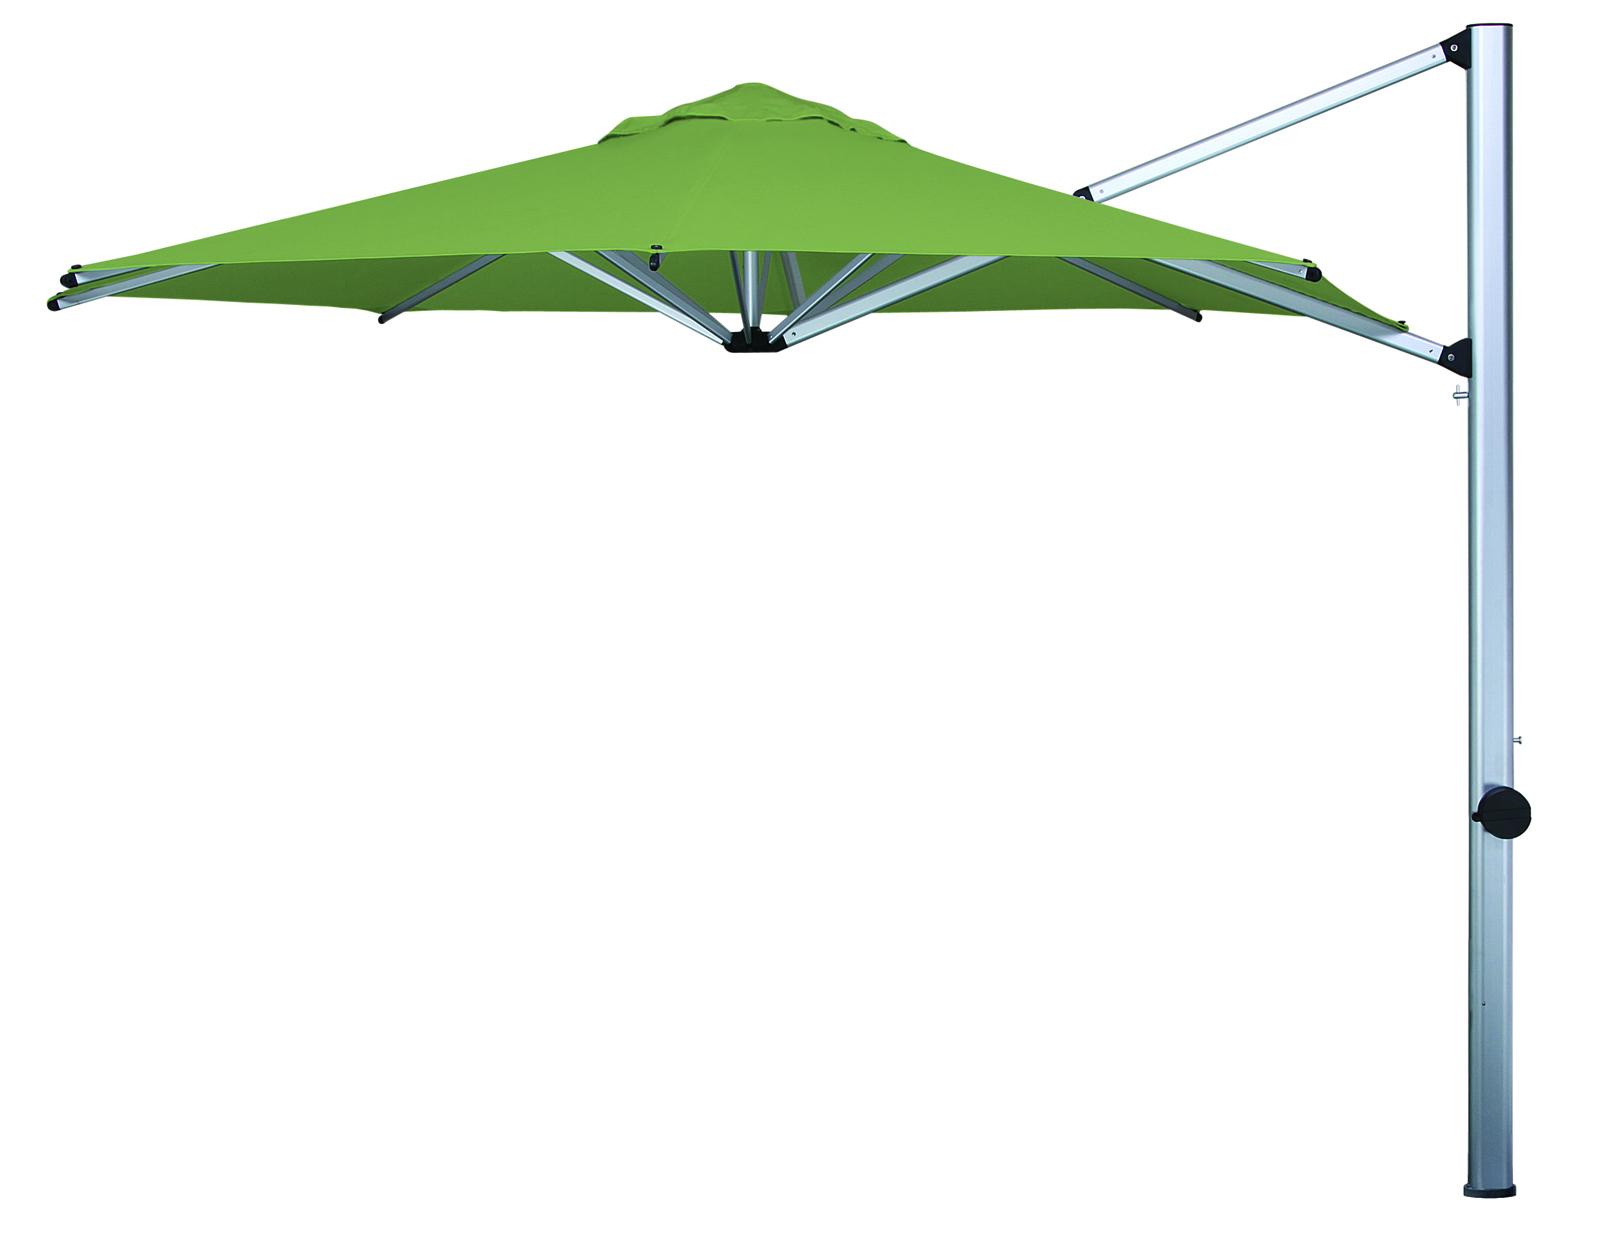 Mald Square Cantilever Umbrellas Throughout Current Resort Umbrellas (View 17 of 20)